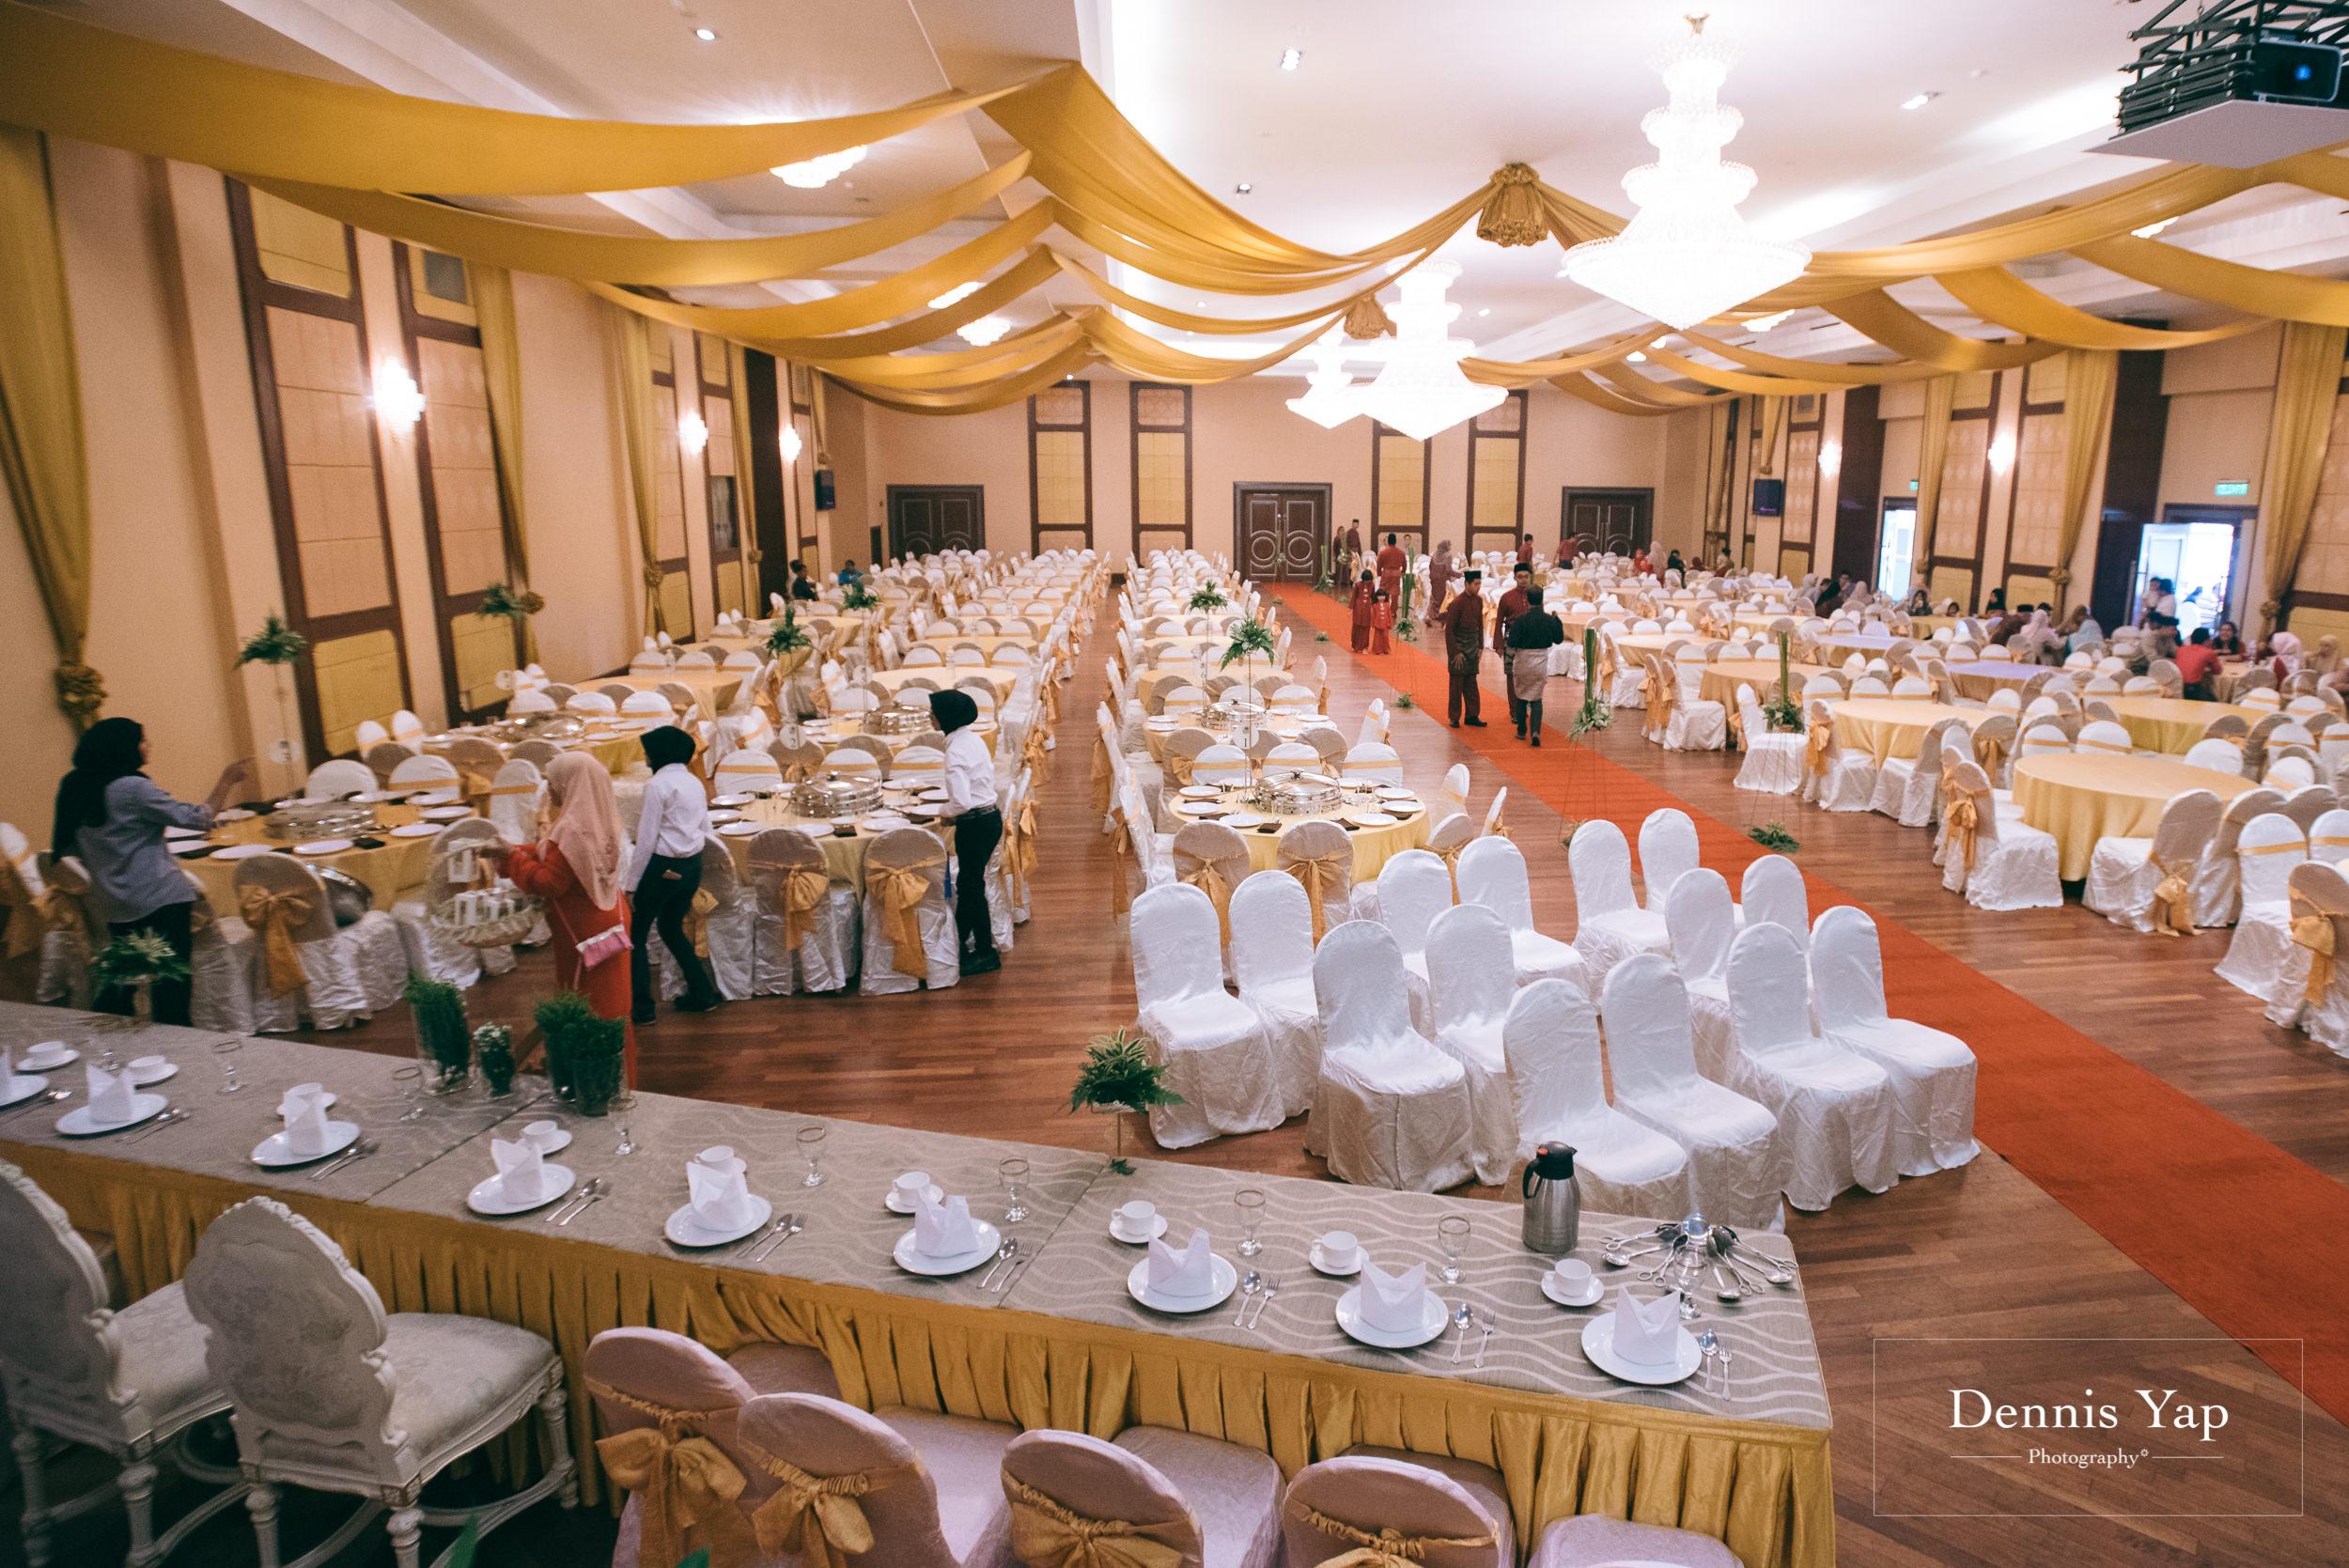 zarif hanalili malay wedding blessing ceremony dennis yap photography-9.jpg